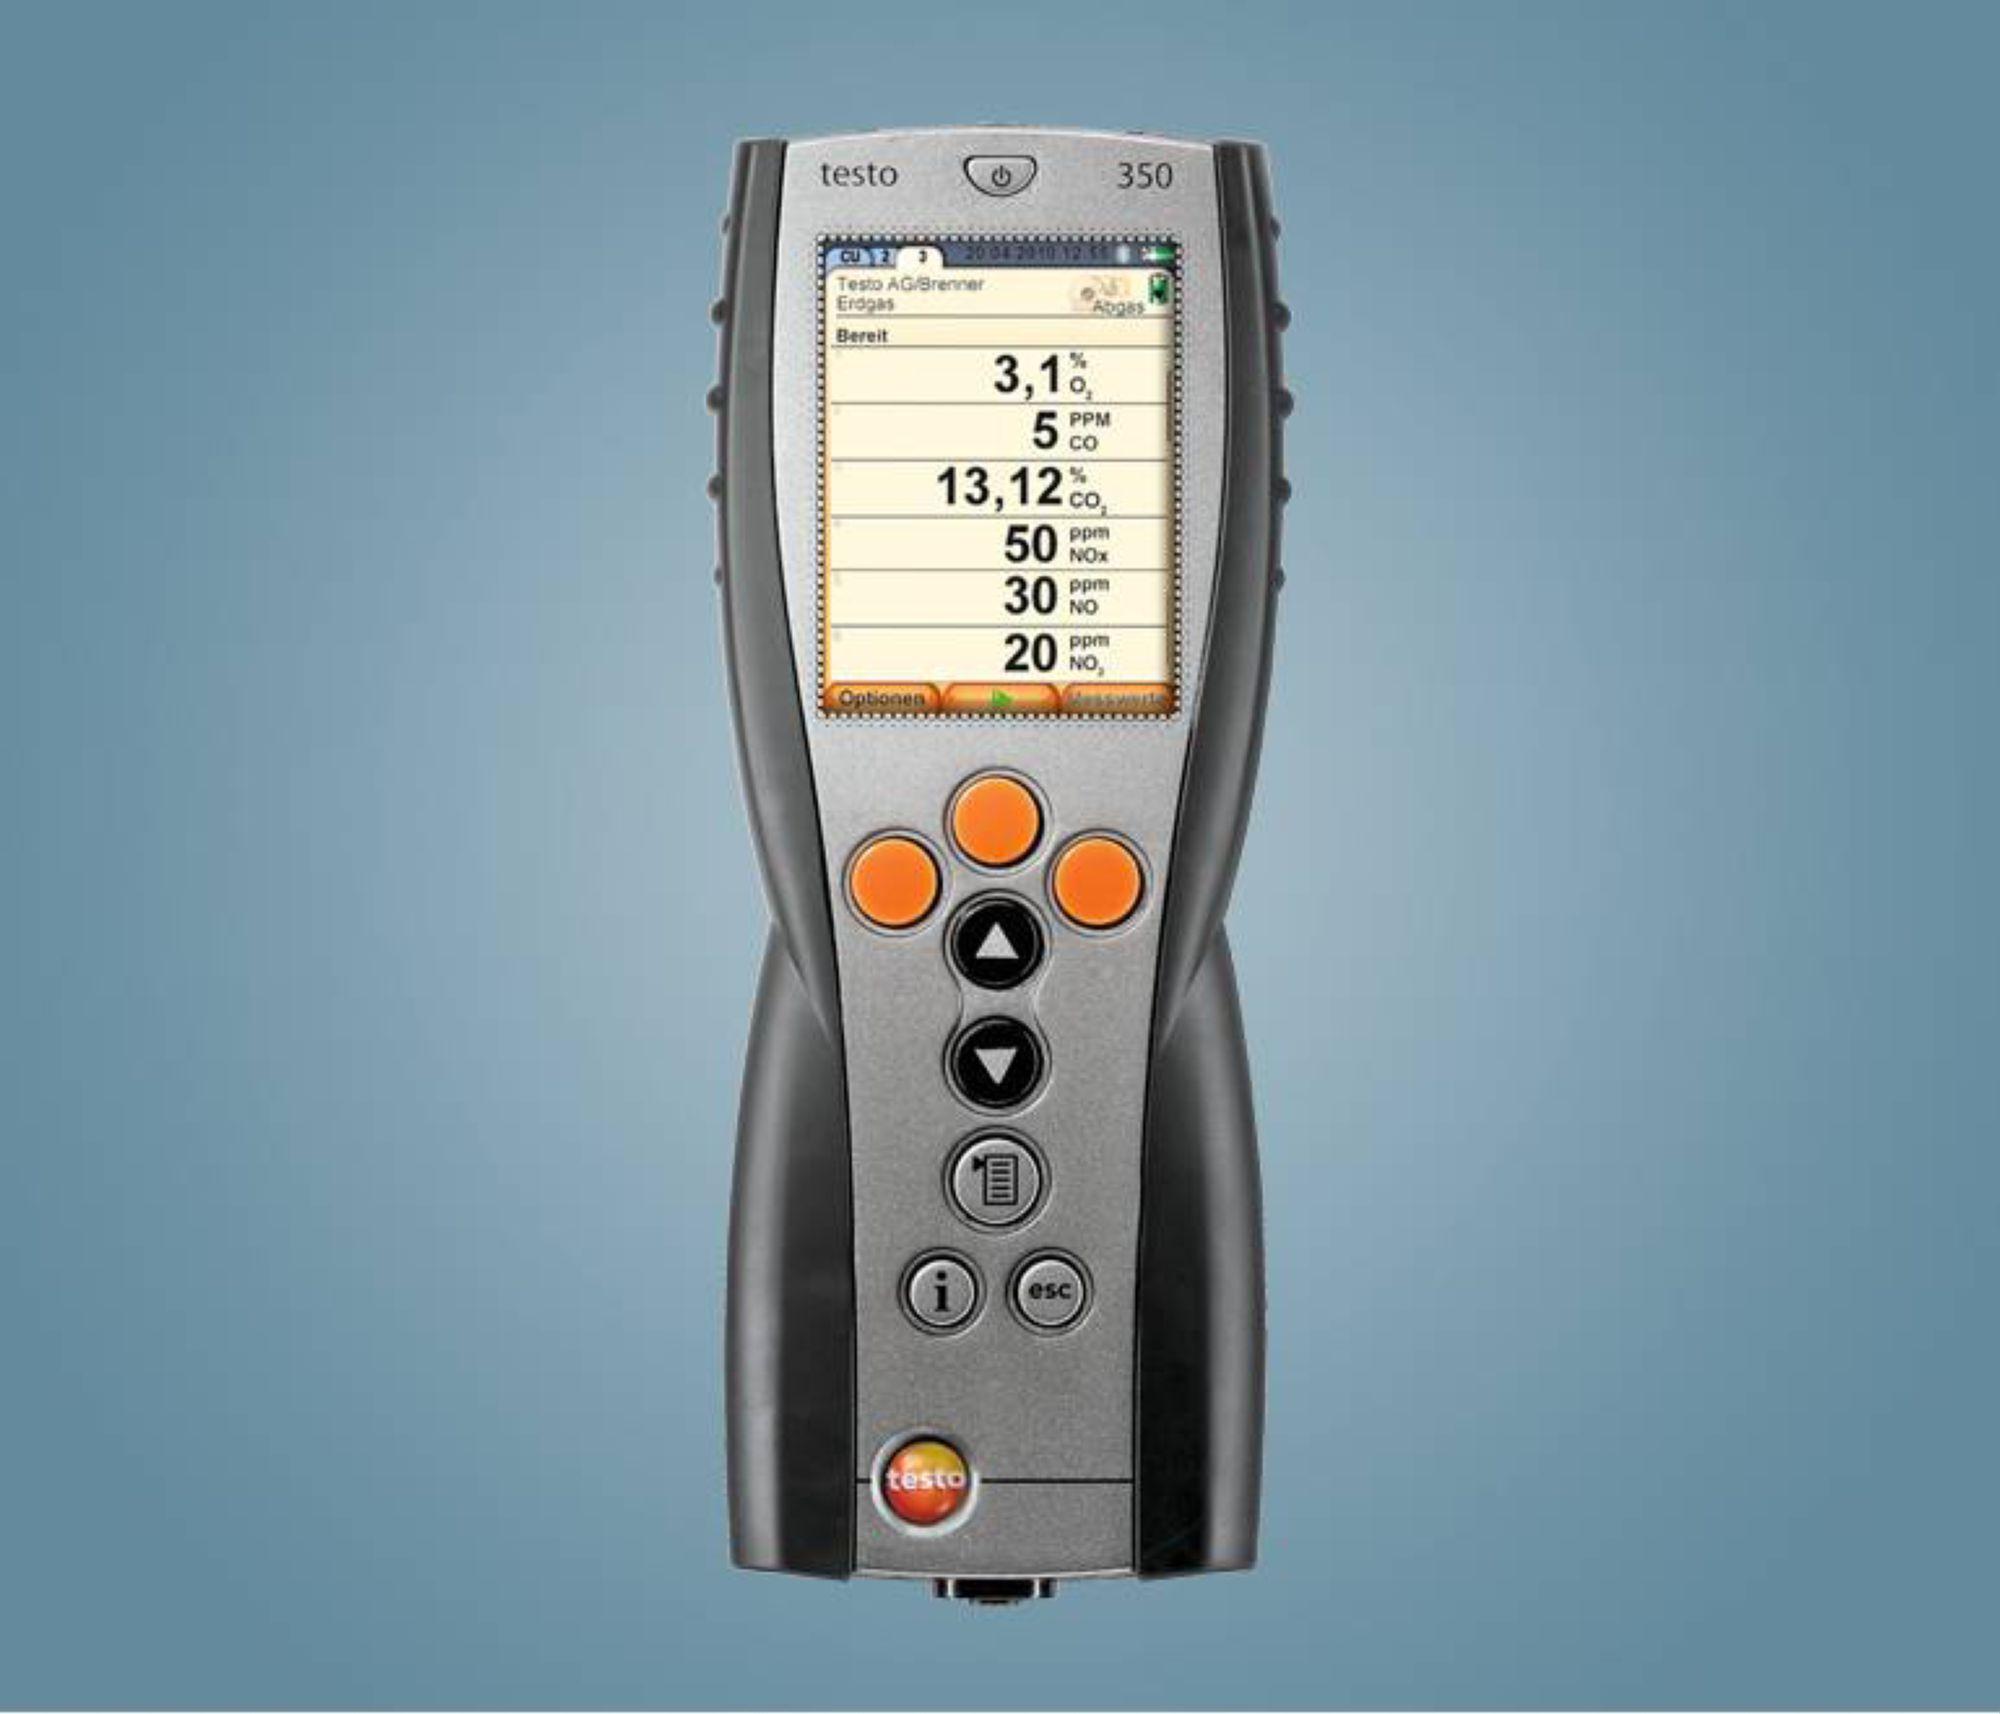 testo 350 烟气分析仪蓝色新版 - 手操器